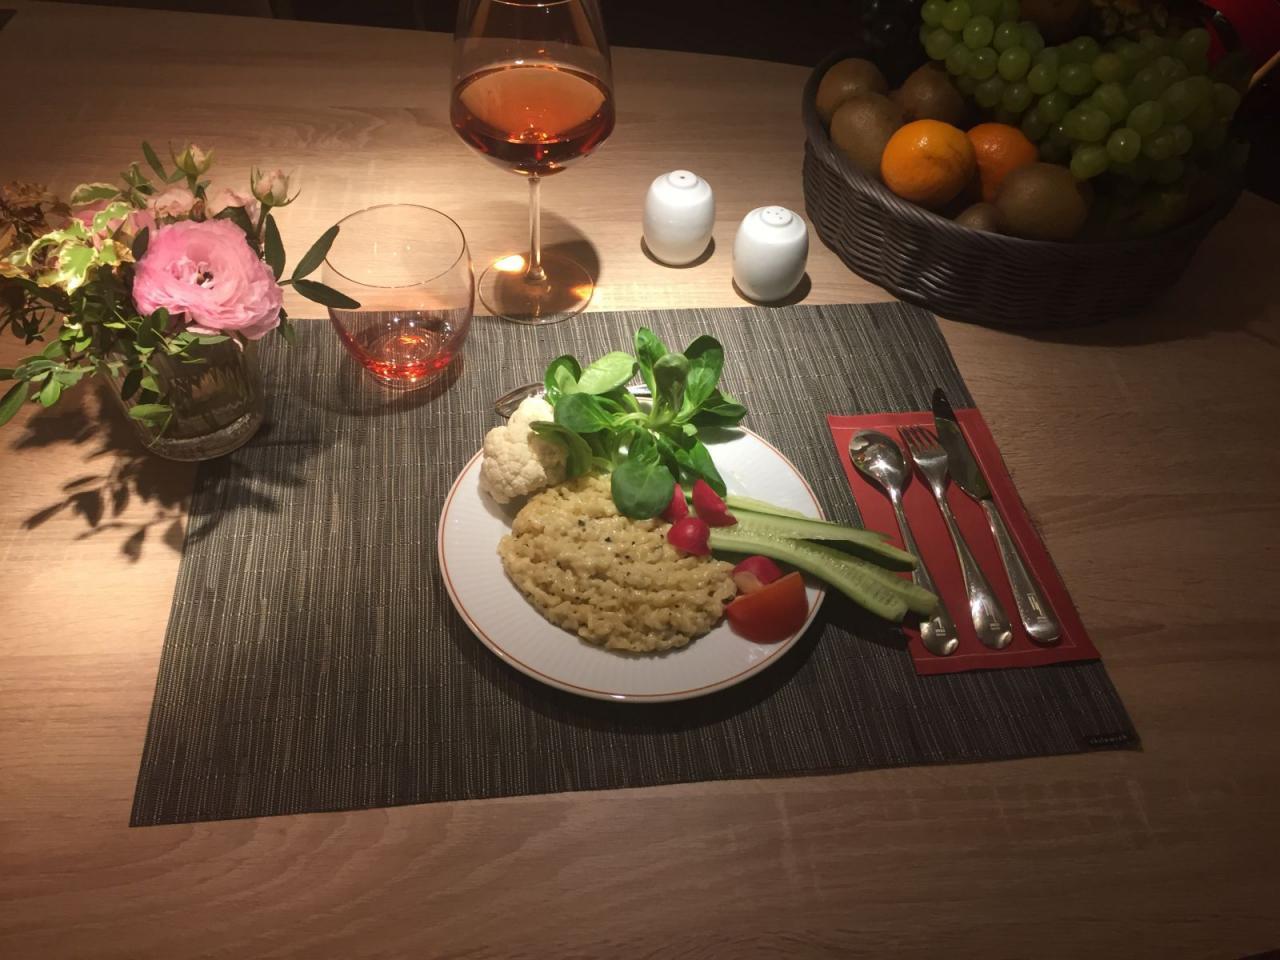 Hotel de Lille - Room Service